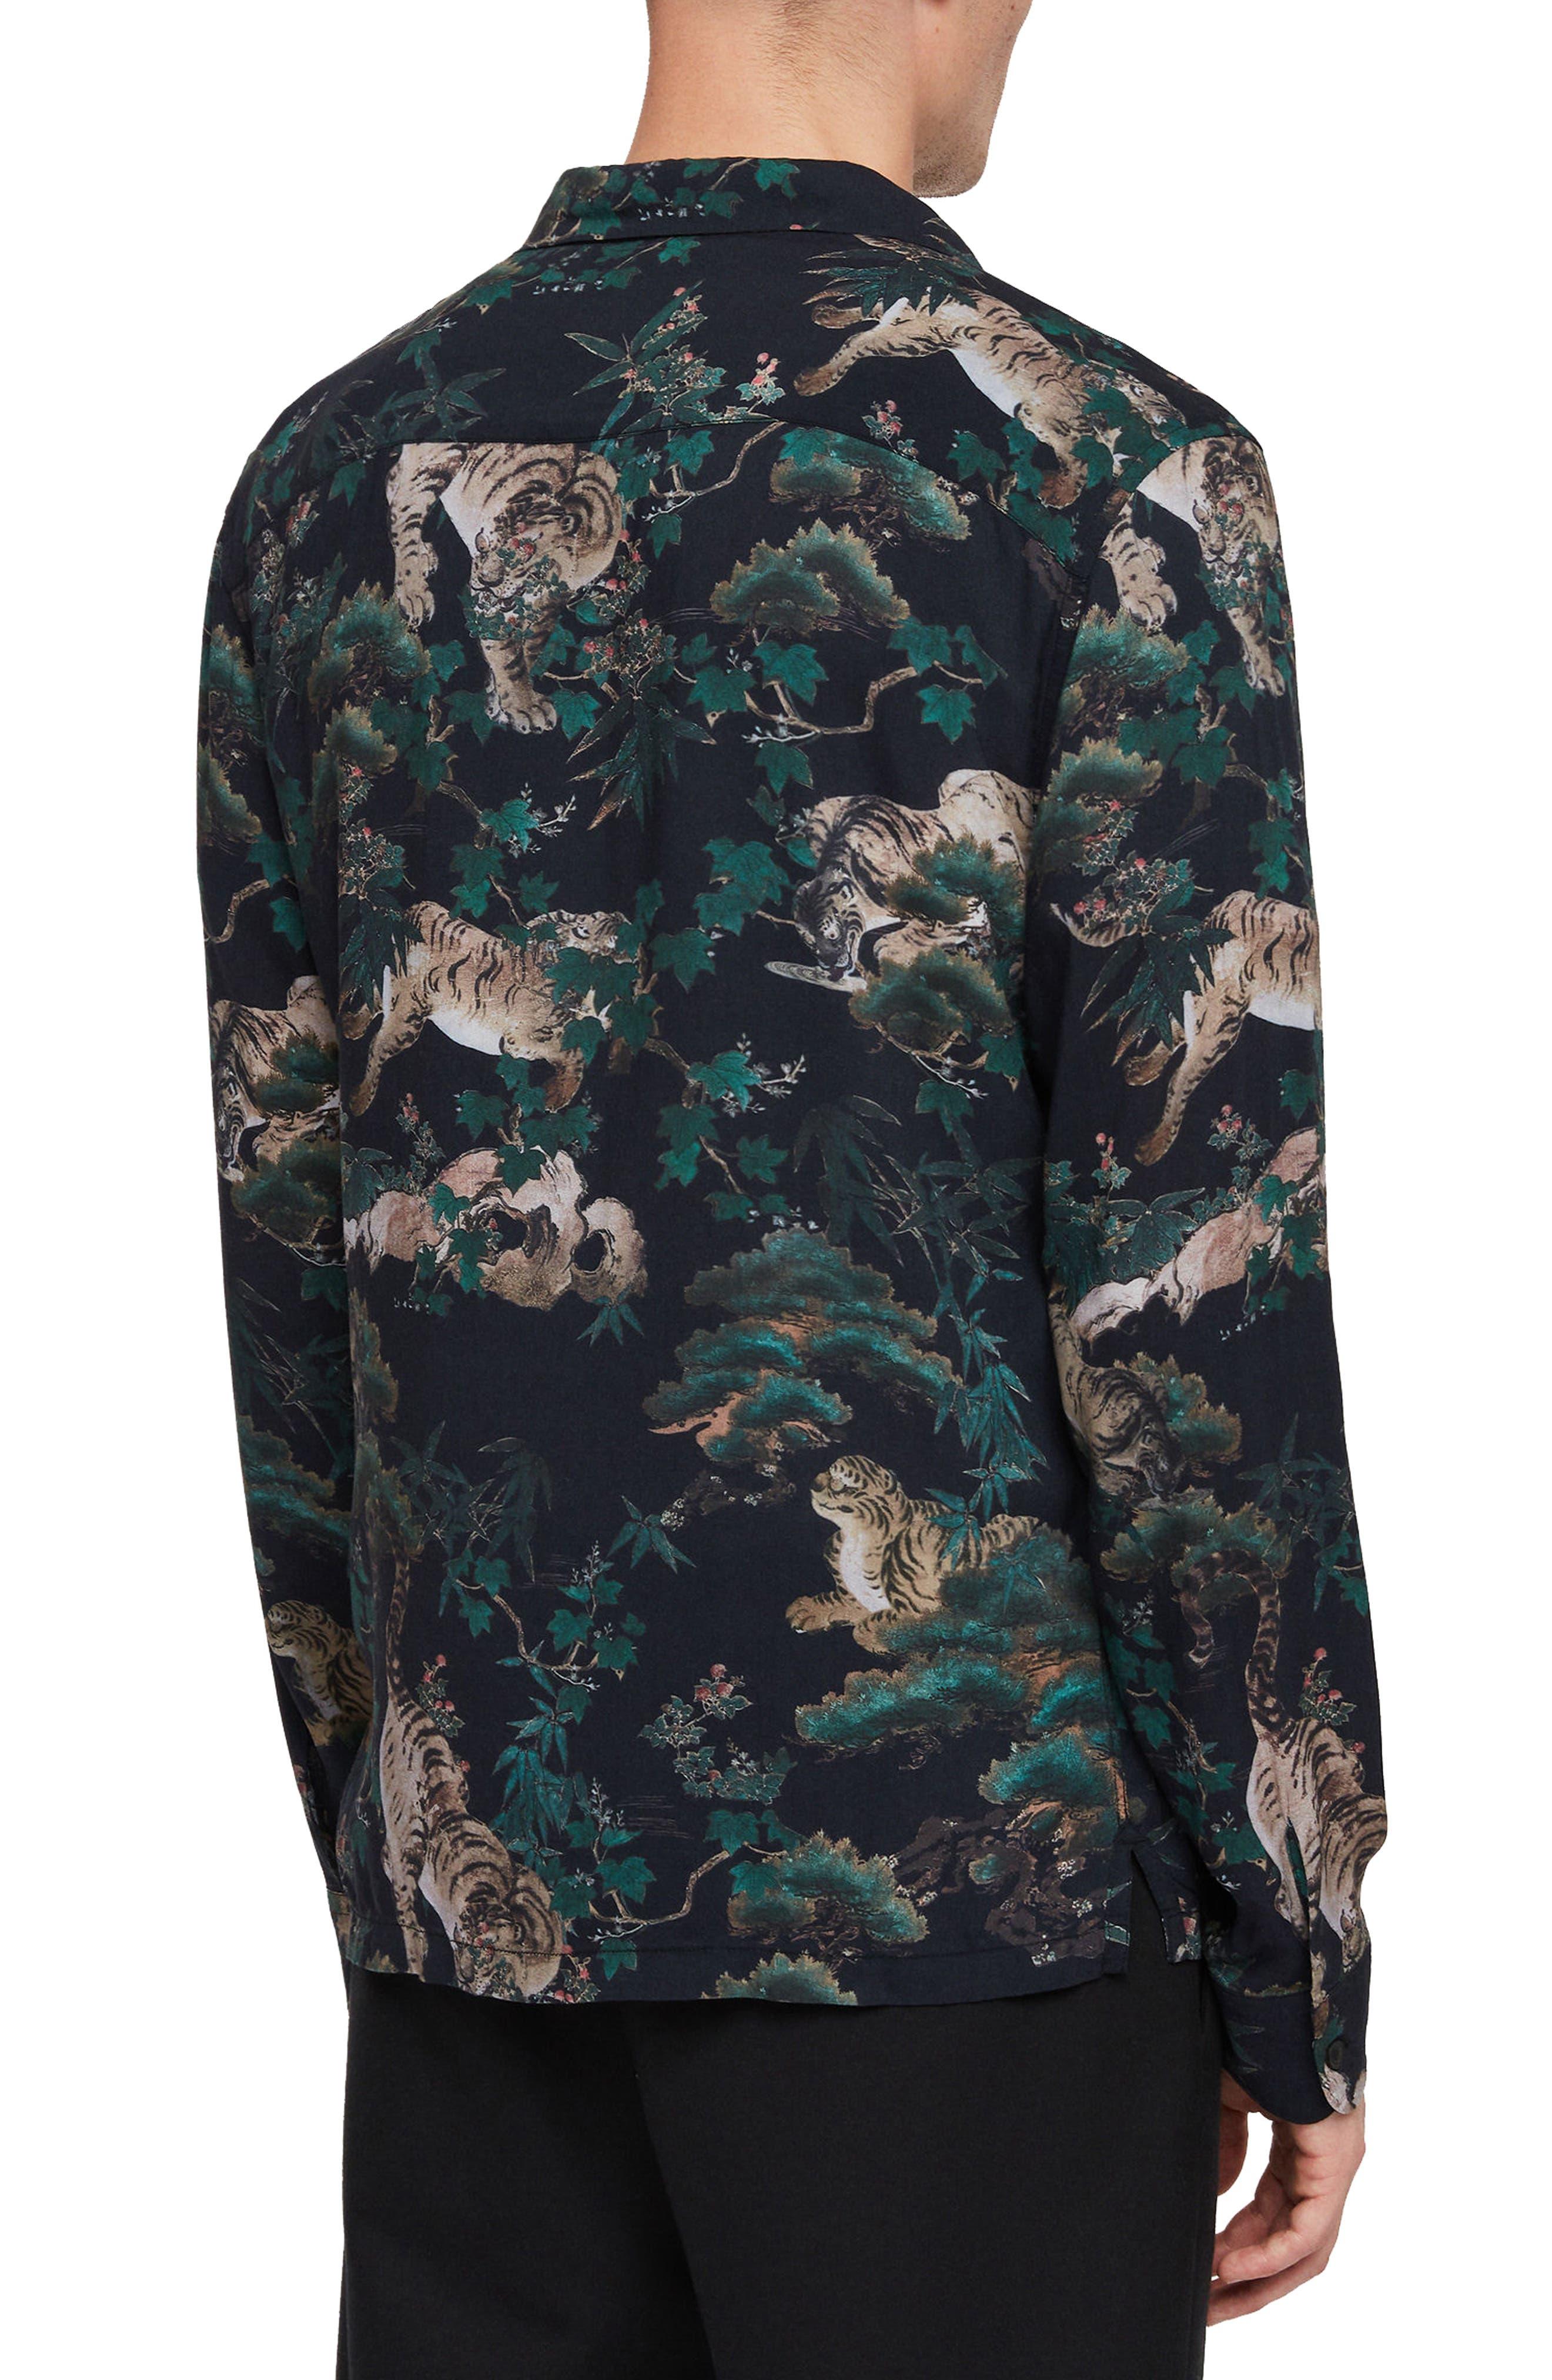 ALLSAINTS, Thicket Tiger Print Sport Shirt, Alternate thumbnail 3, color, 003